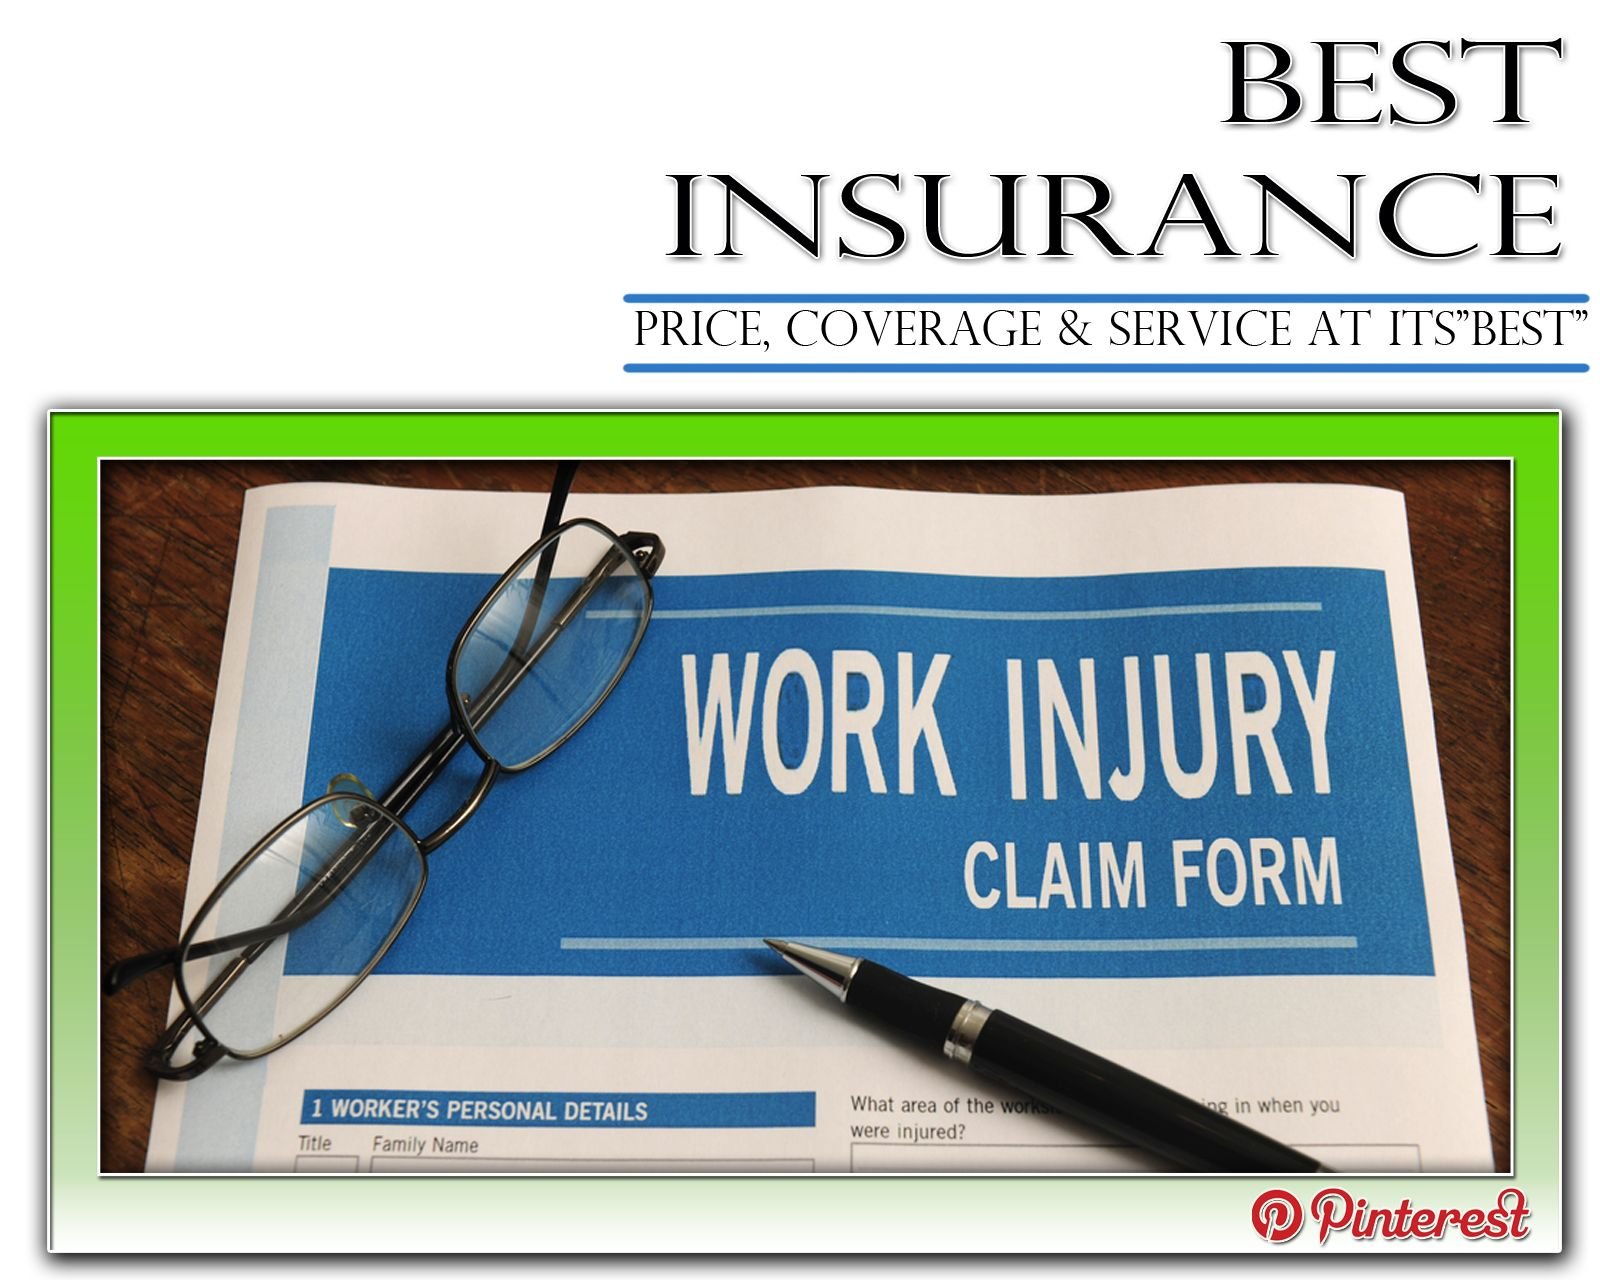 Homeownersinsuranceft Lauderdale Workers Compensation Insurance